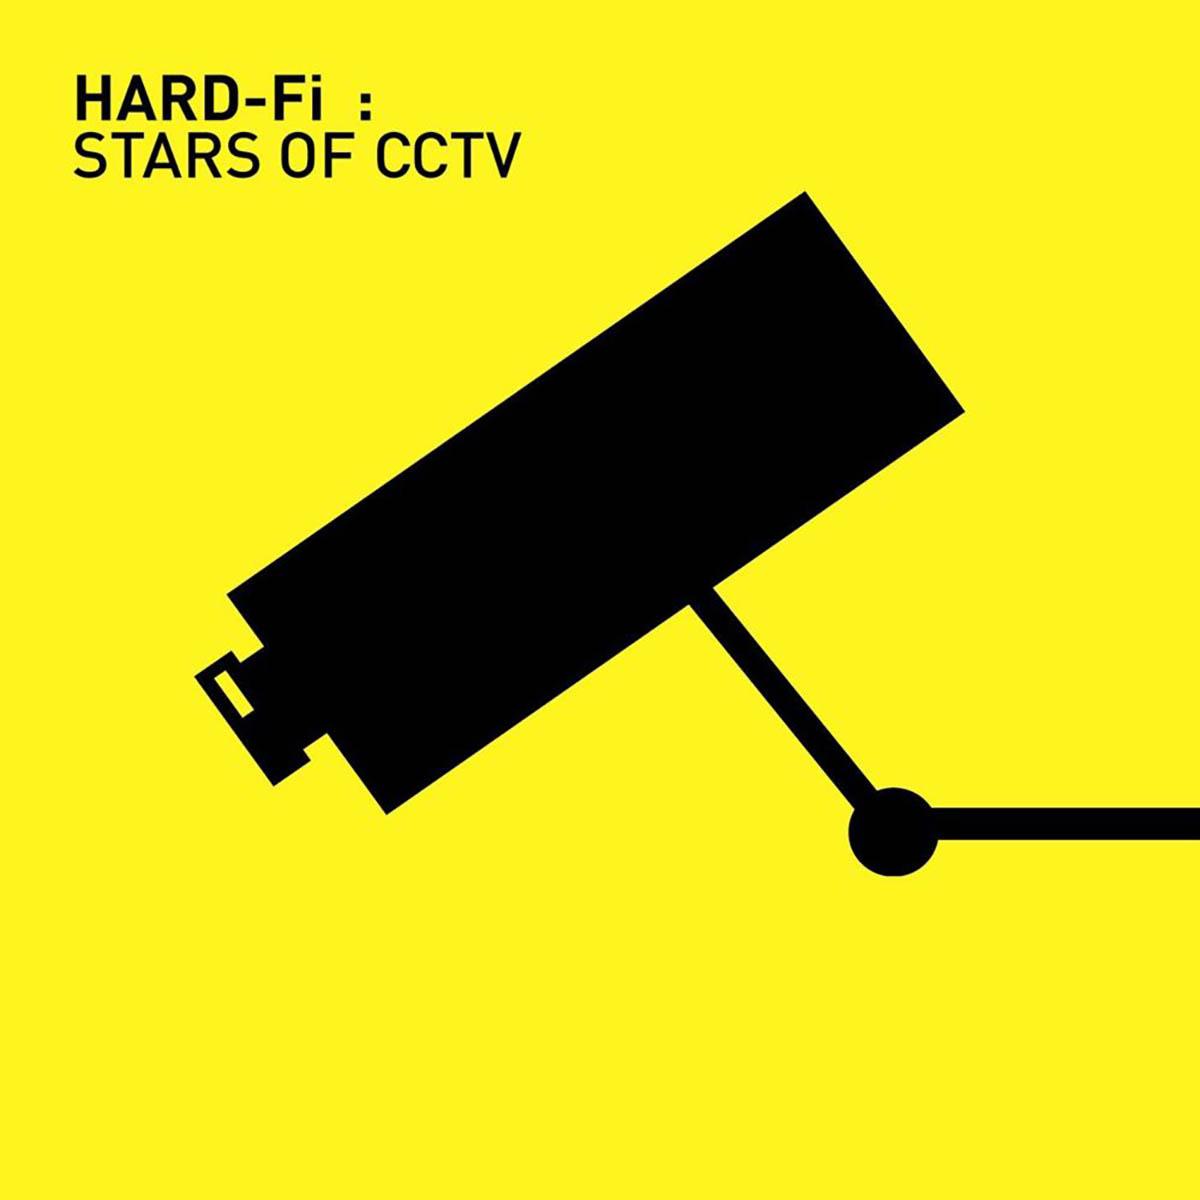 Hard-Fi, Stars Of CCTV